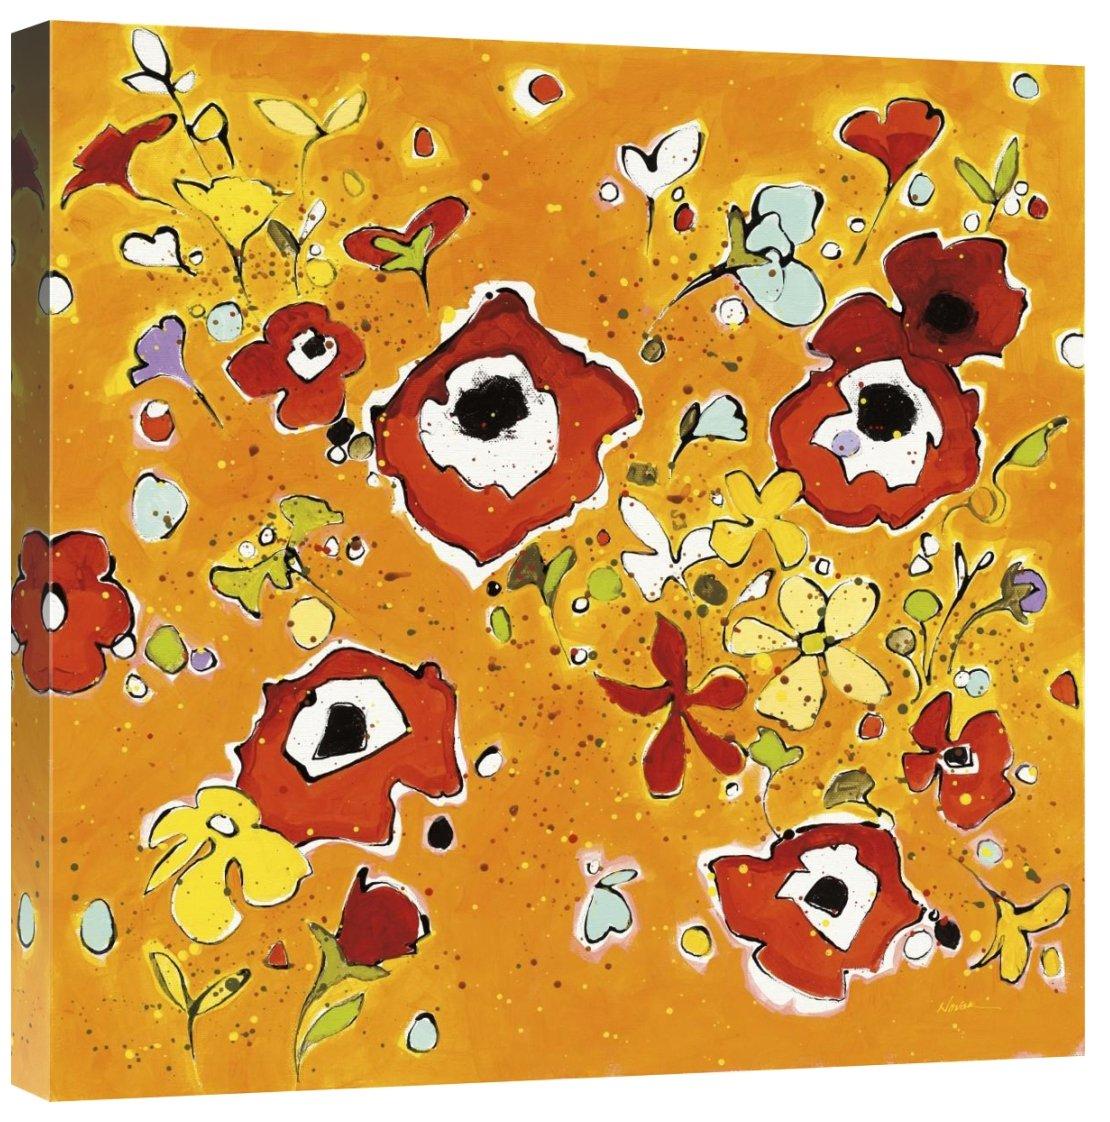 Global Gallery Shirley Novak Fleur Amusement Giclee Stretched Canvas Artwork 24 x 24